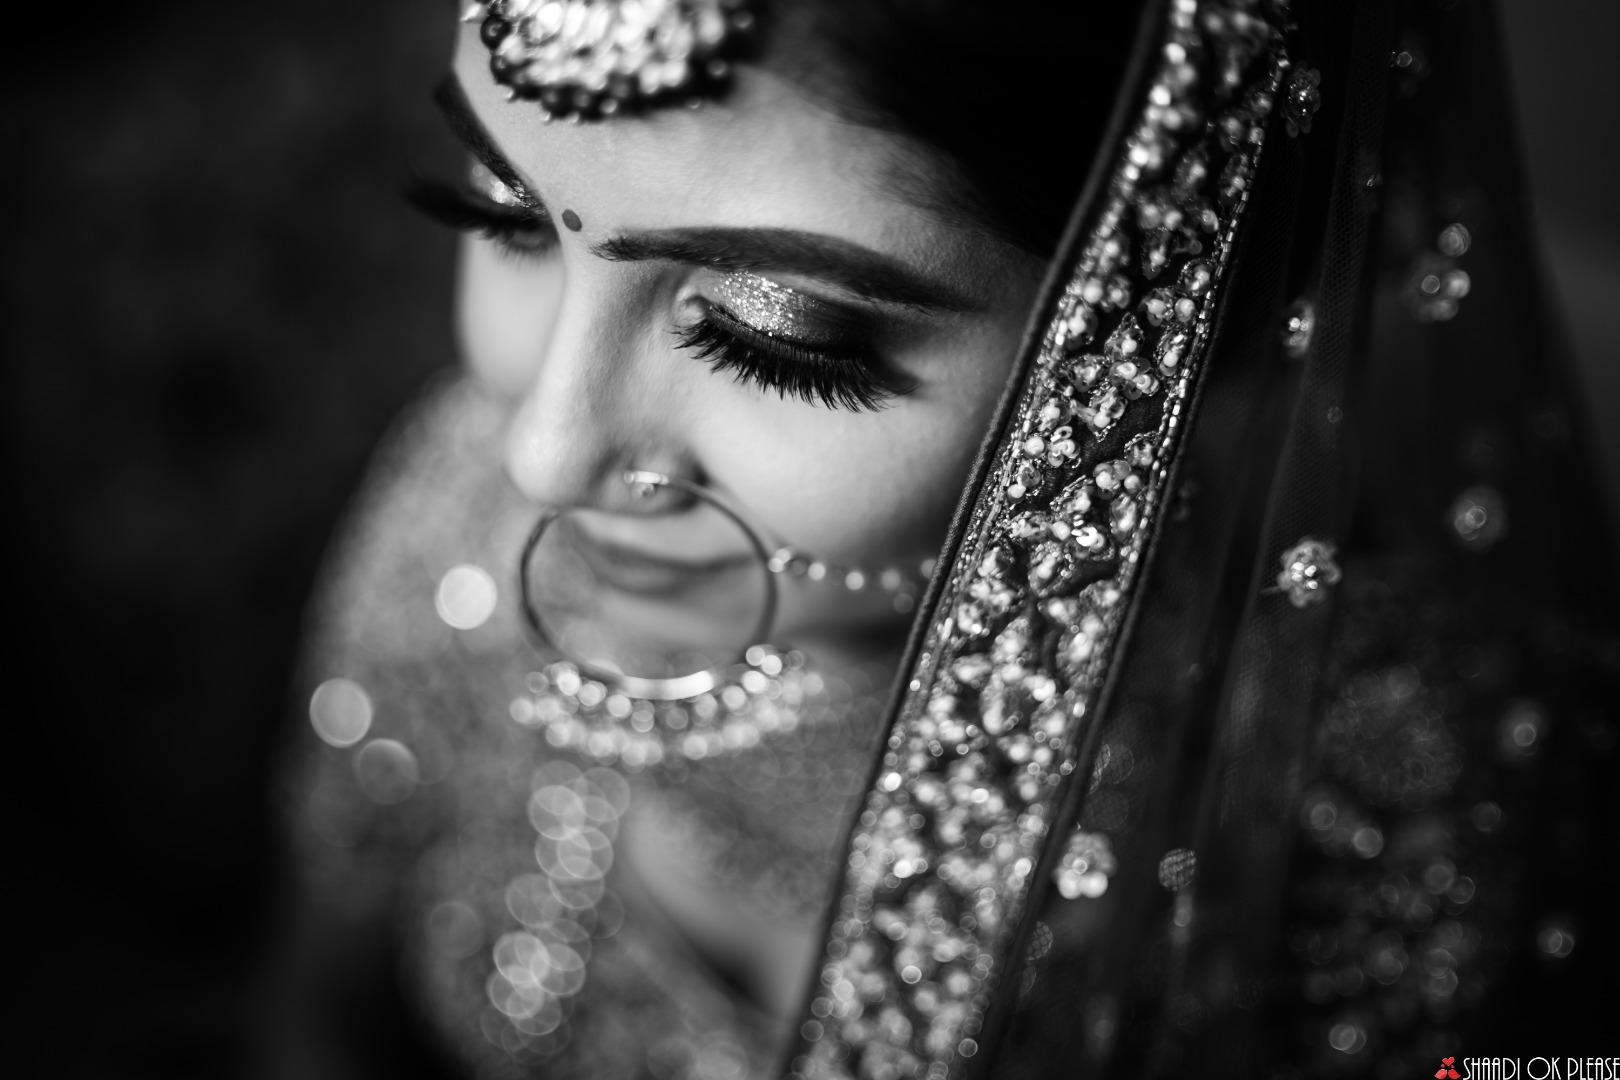 Stunning Black and White Bridal Portrait